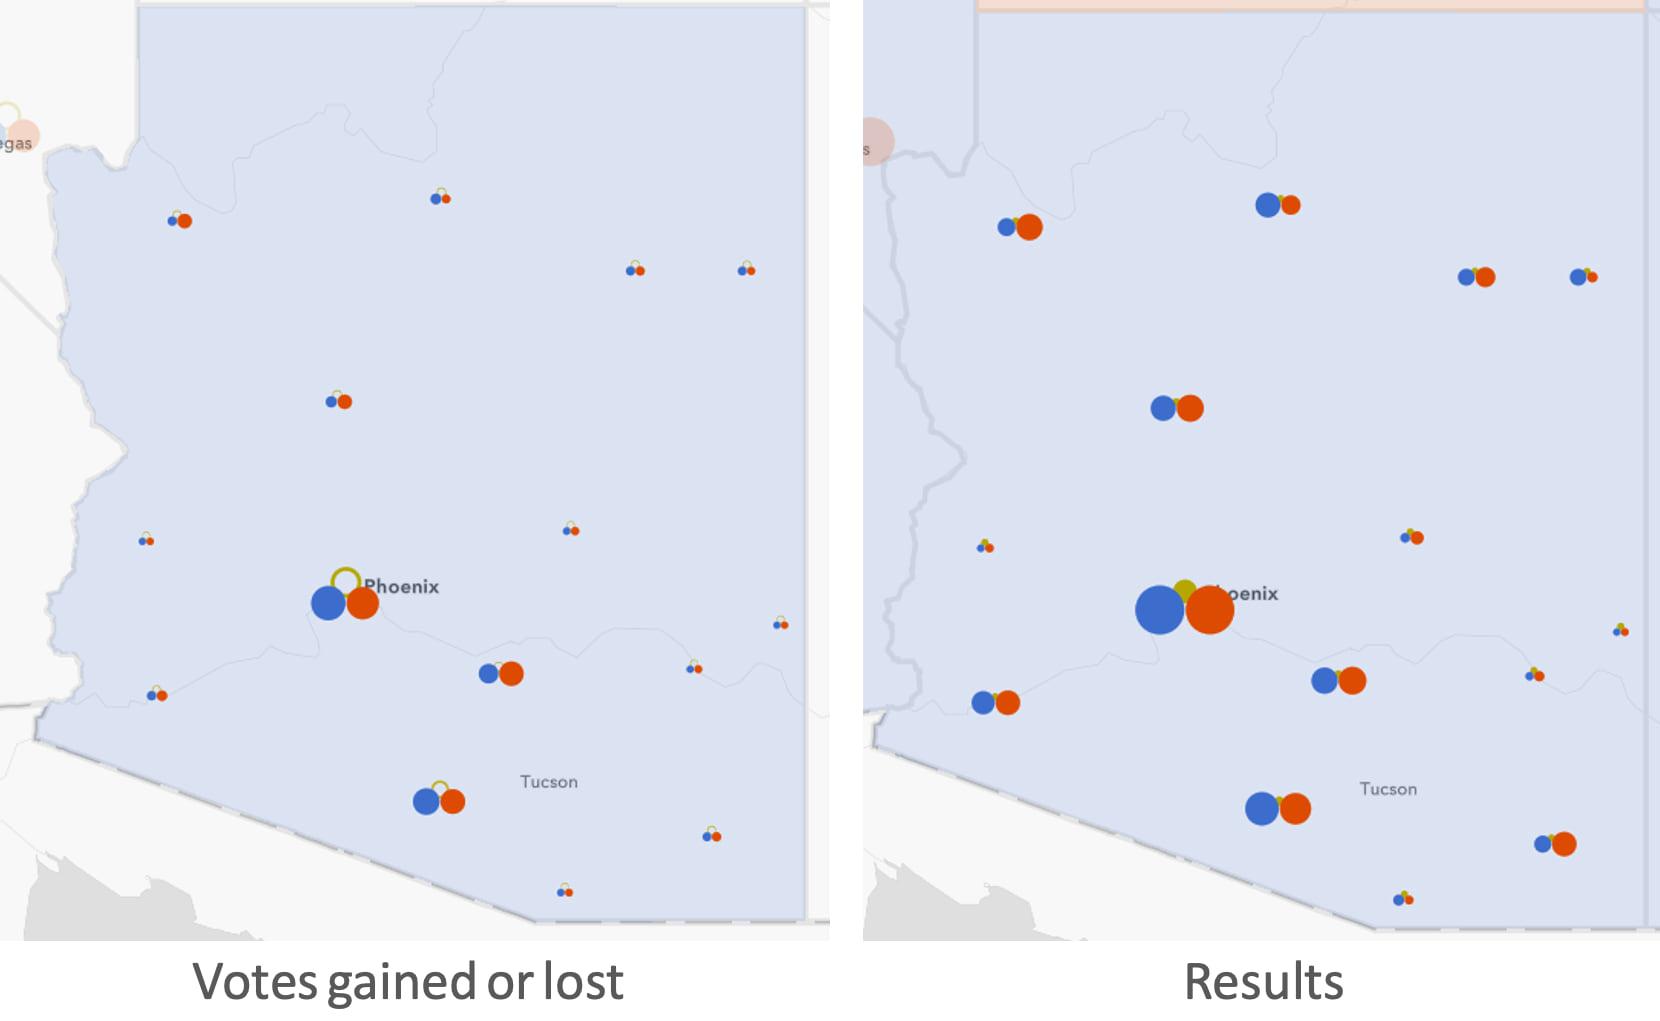 Arizona county shift and total votes.